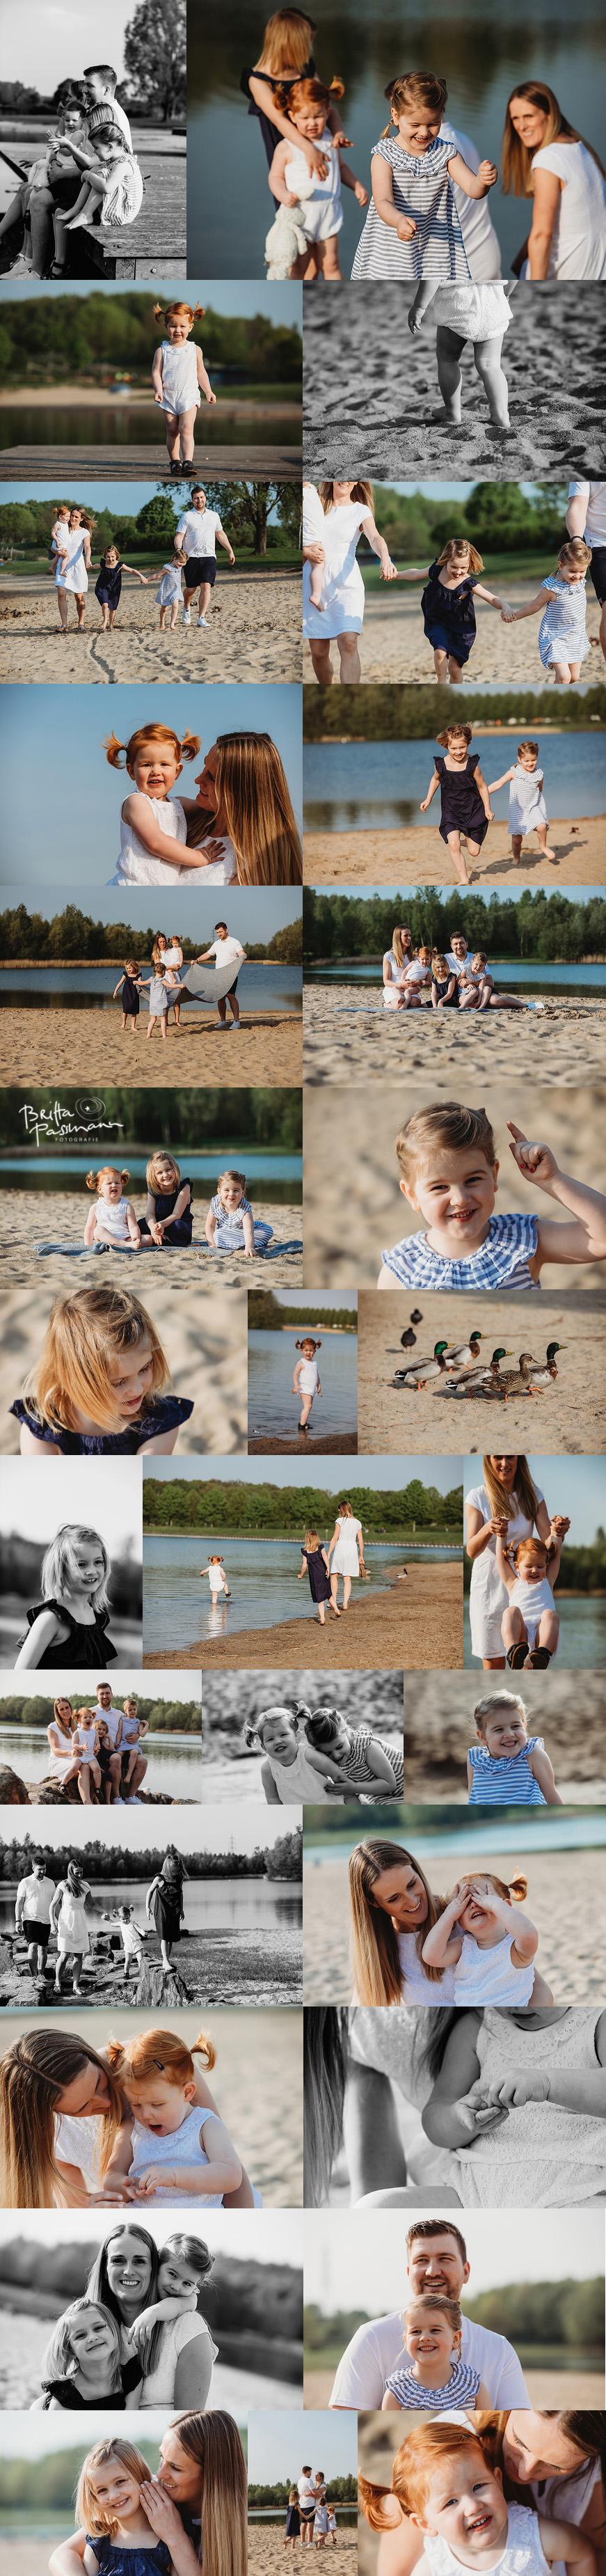 Familienfotoshooting-Kinderfotoshooting-Dortmund-Lünen-Fotos-am-See-in-der-Natur